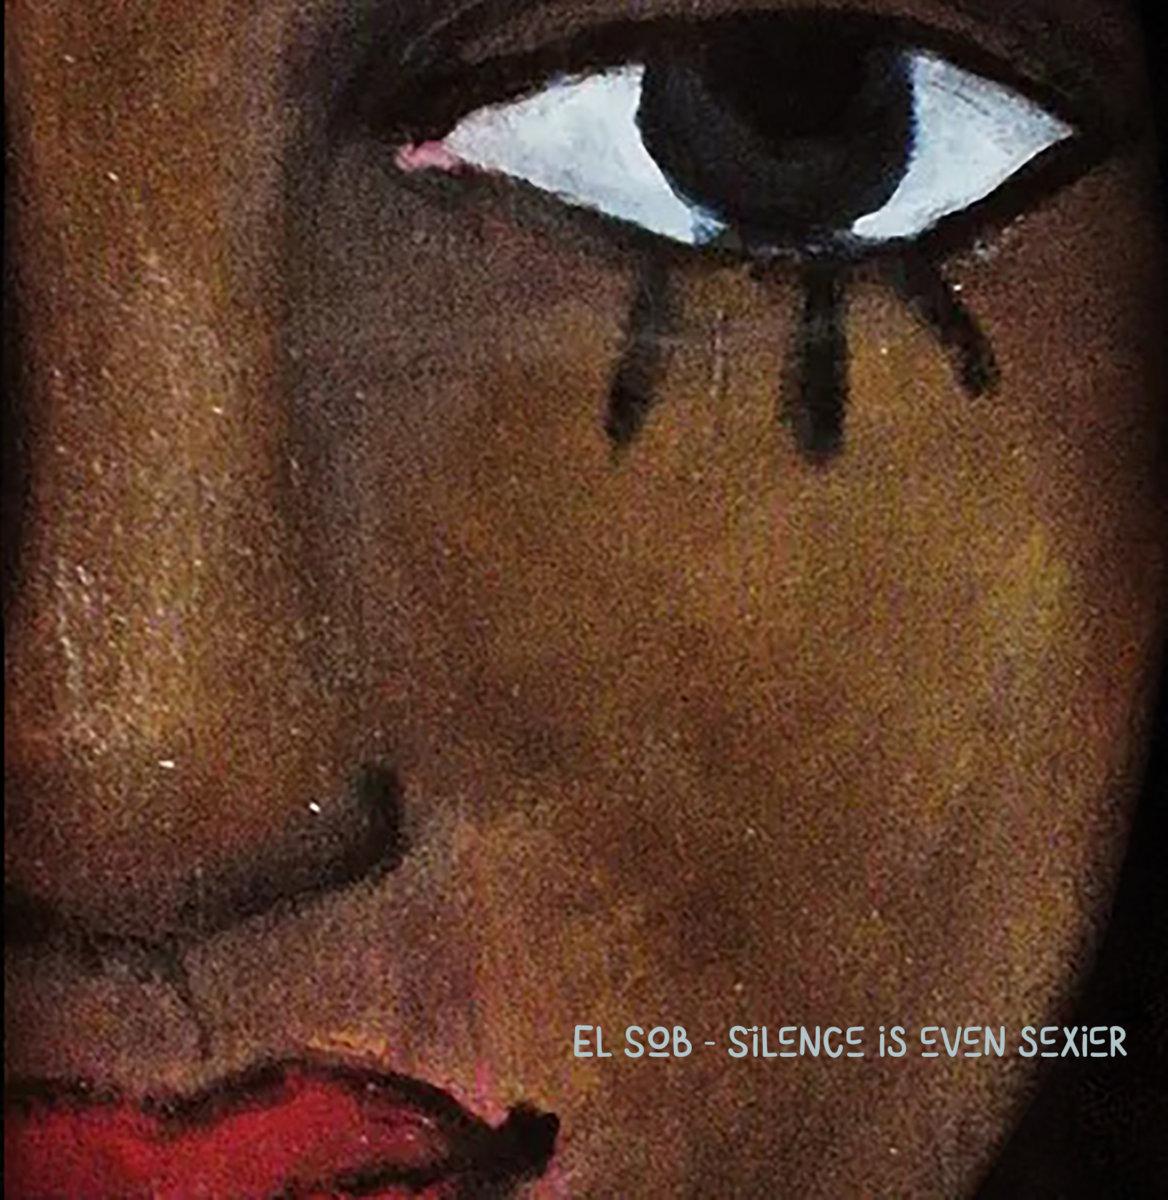 El Sob – Silence is even sexier